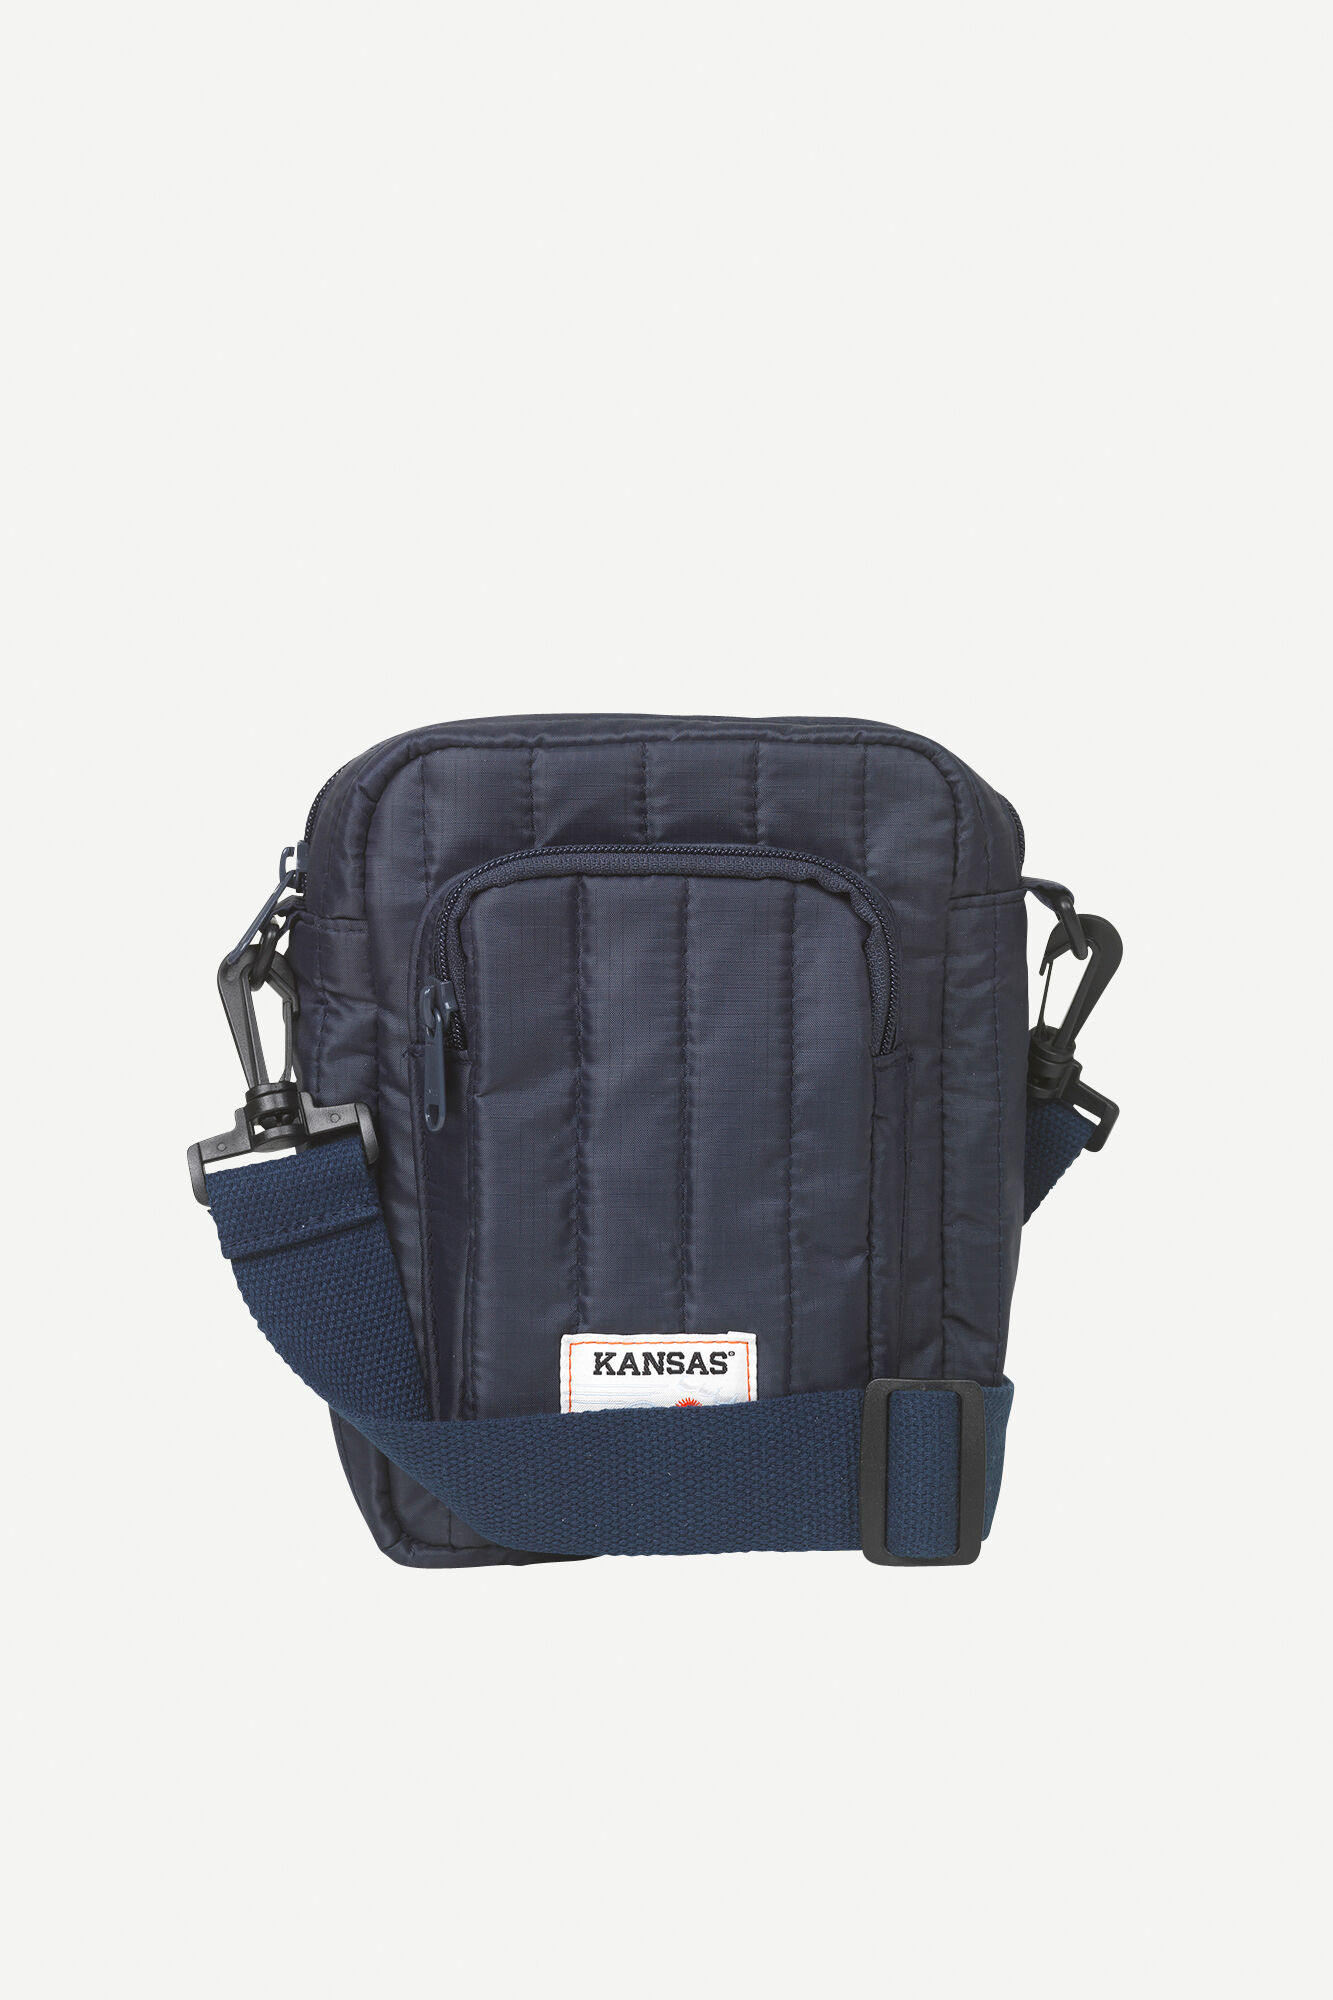 Kansas M bag 12655